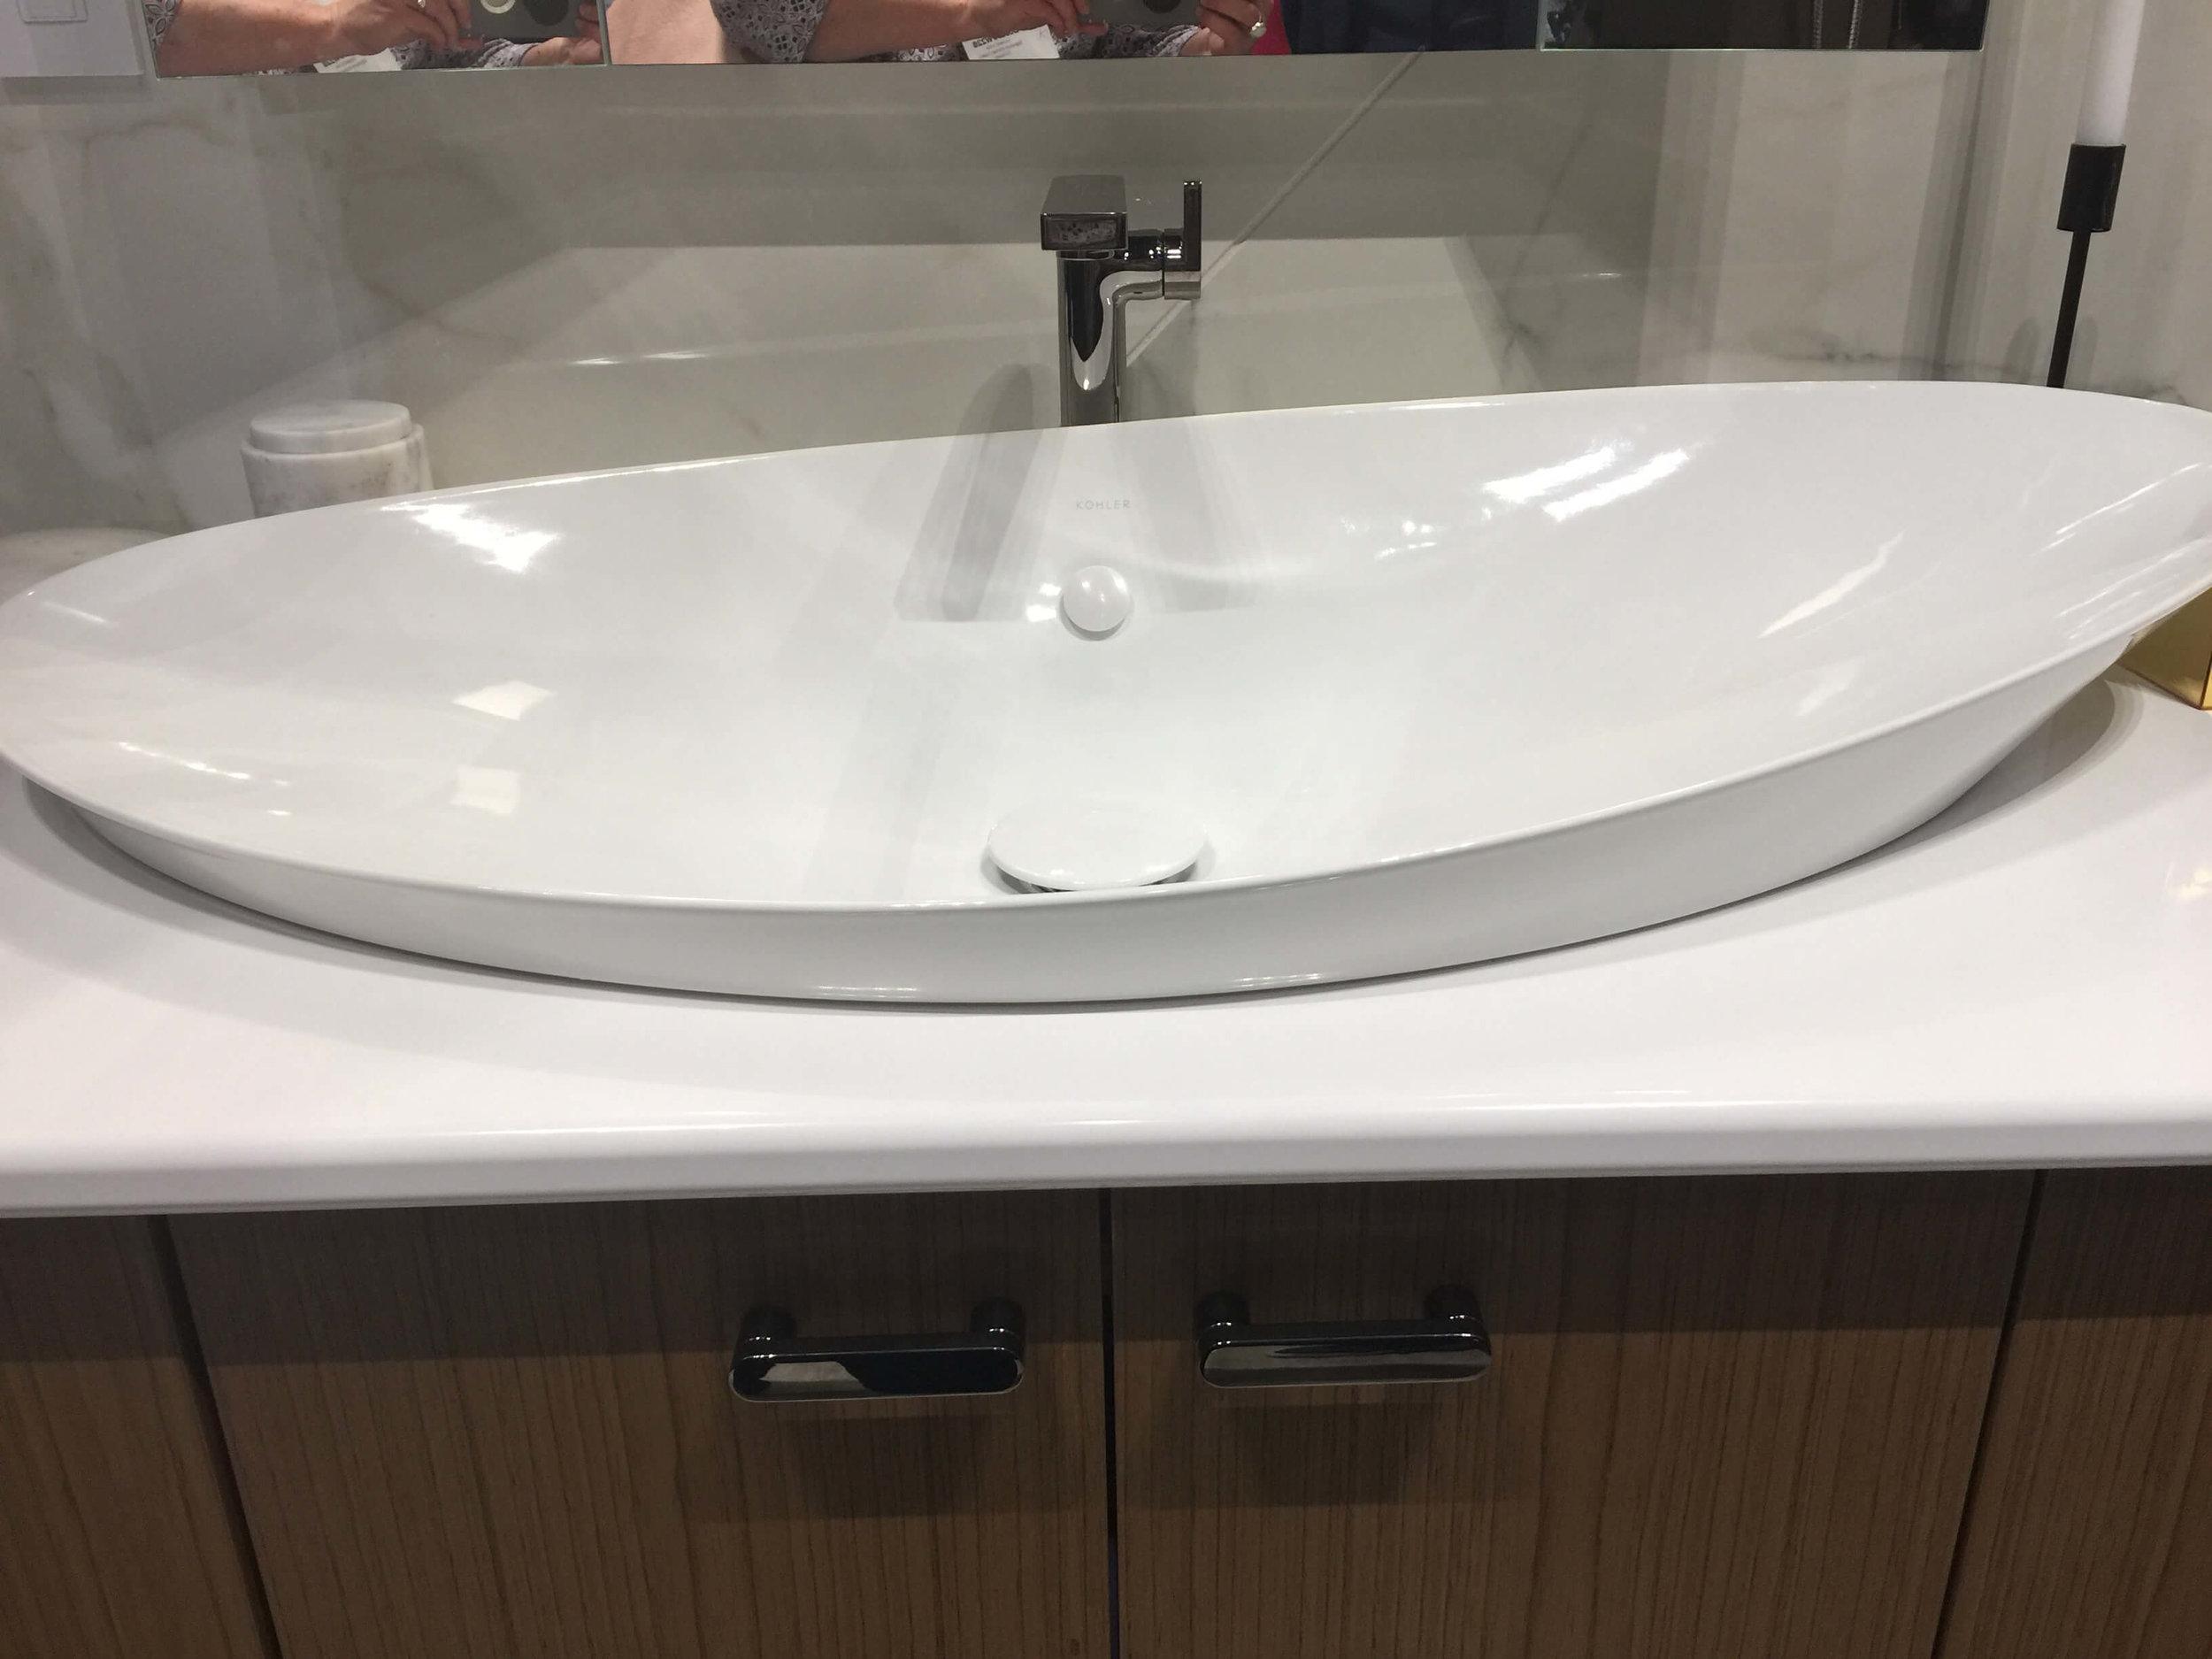 New sink intros from Kohler at KBIS2018 like this wide, asymmetrical vessel sink #sink #vesselsink